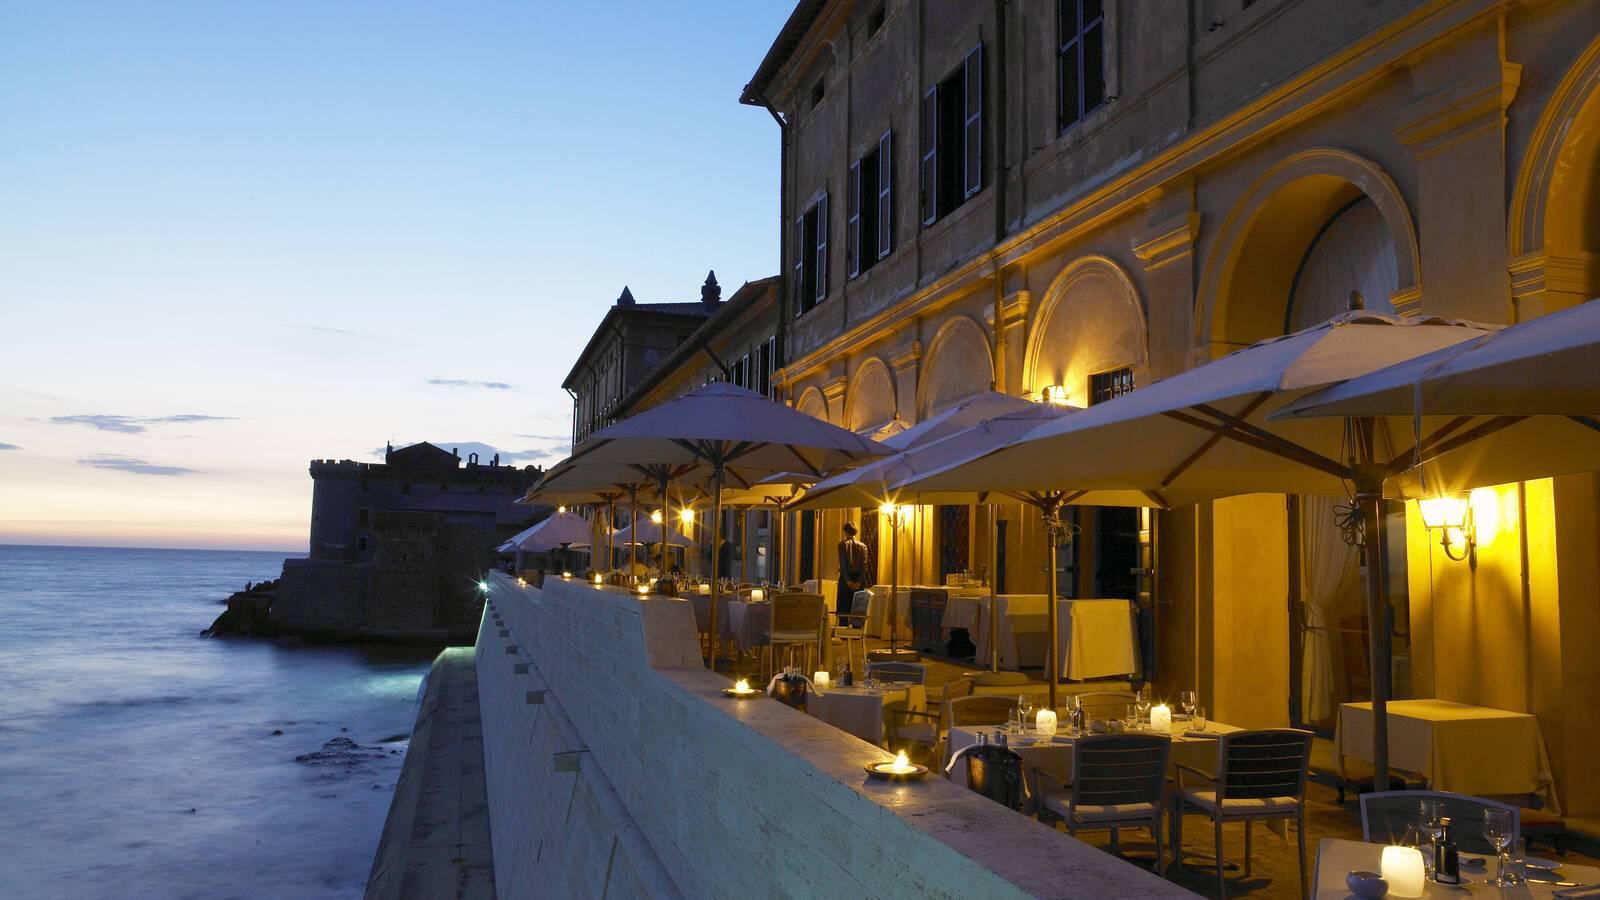 La Posta Vecchia Restaurant The Cesar Terrasse Rome